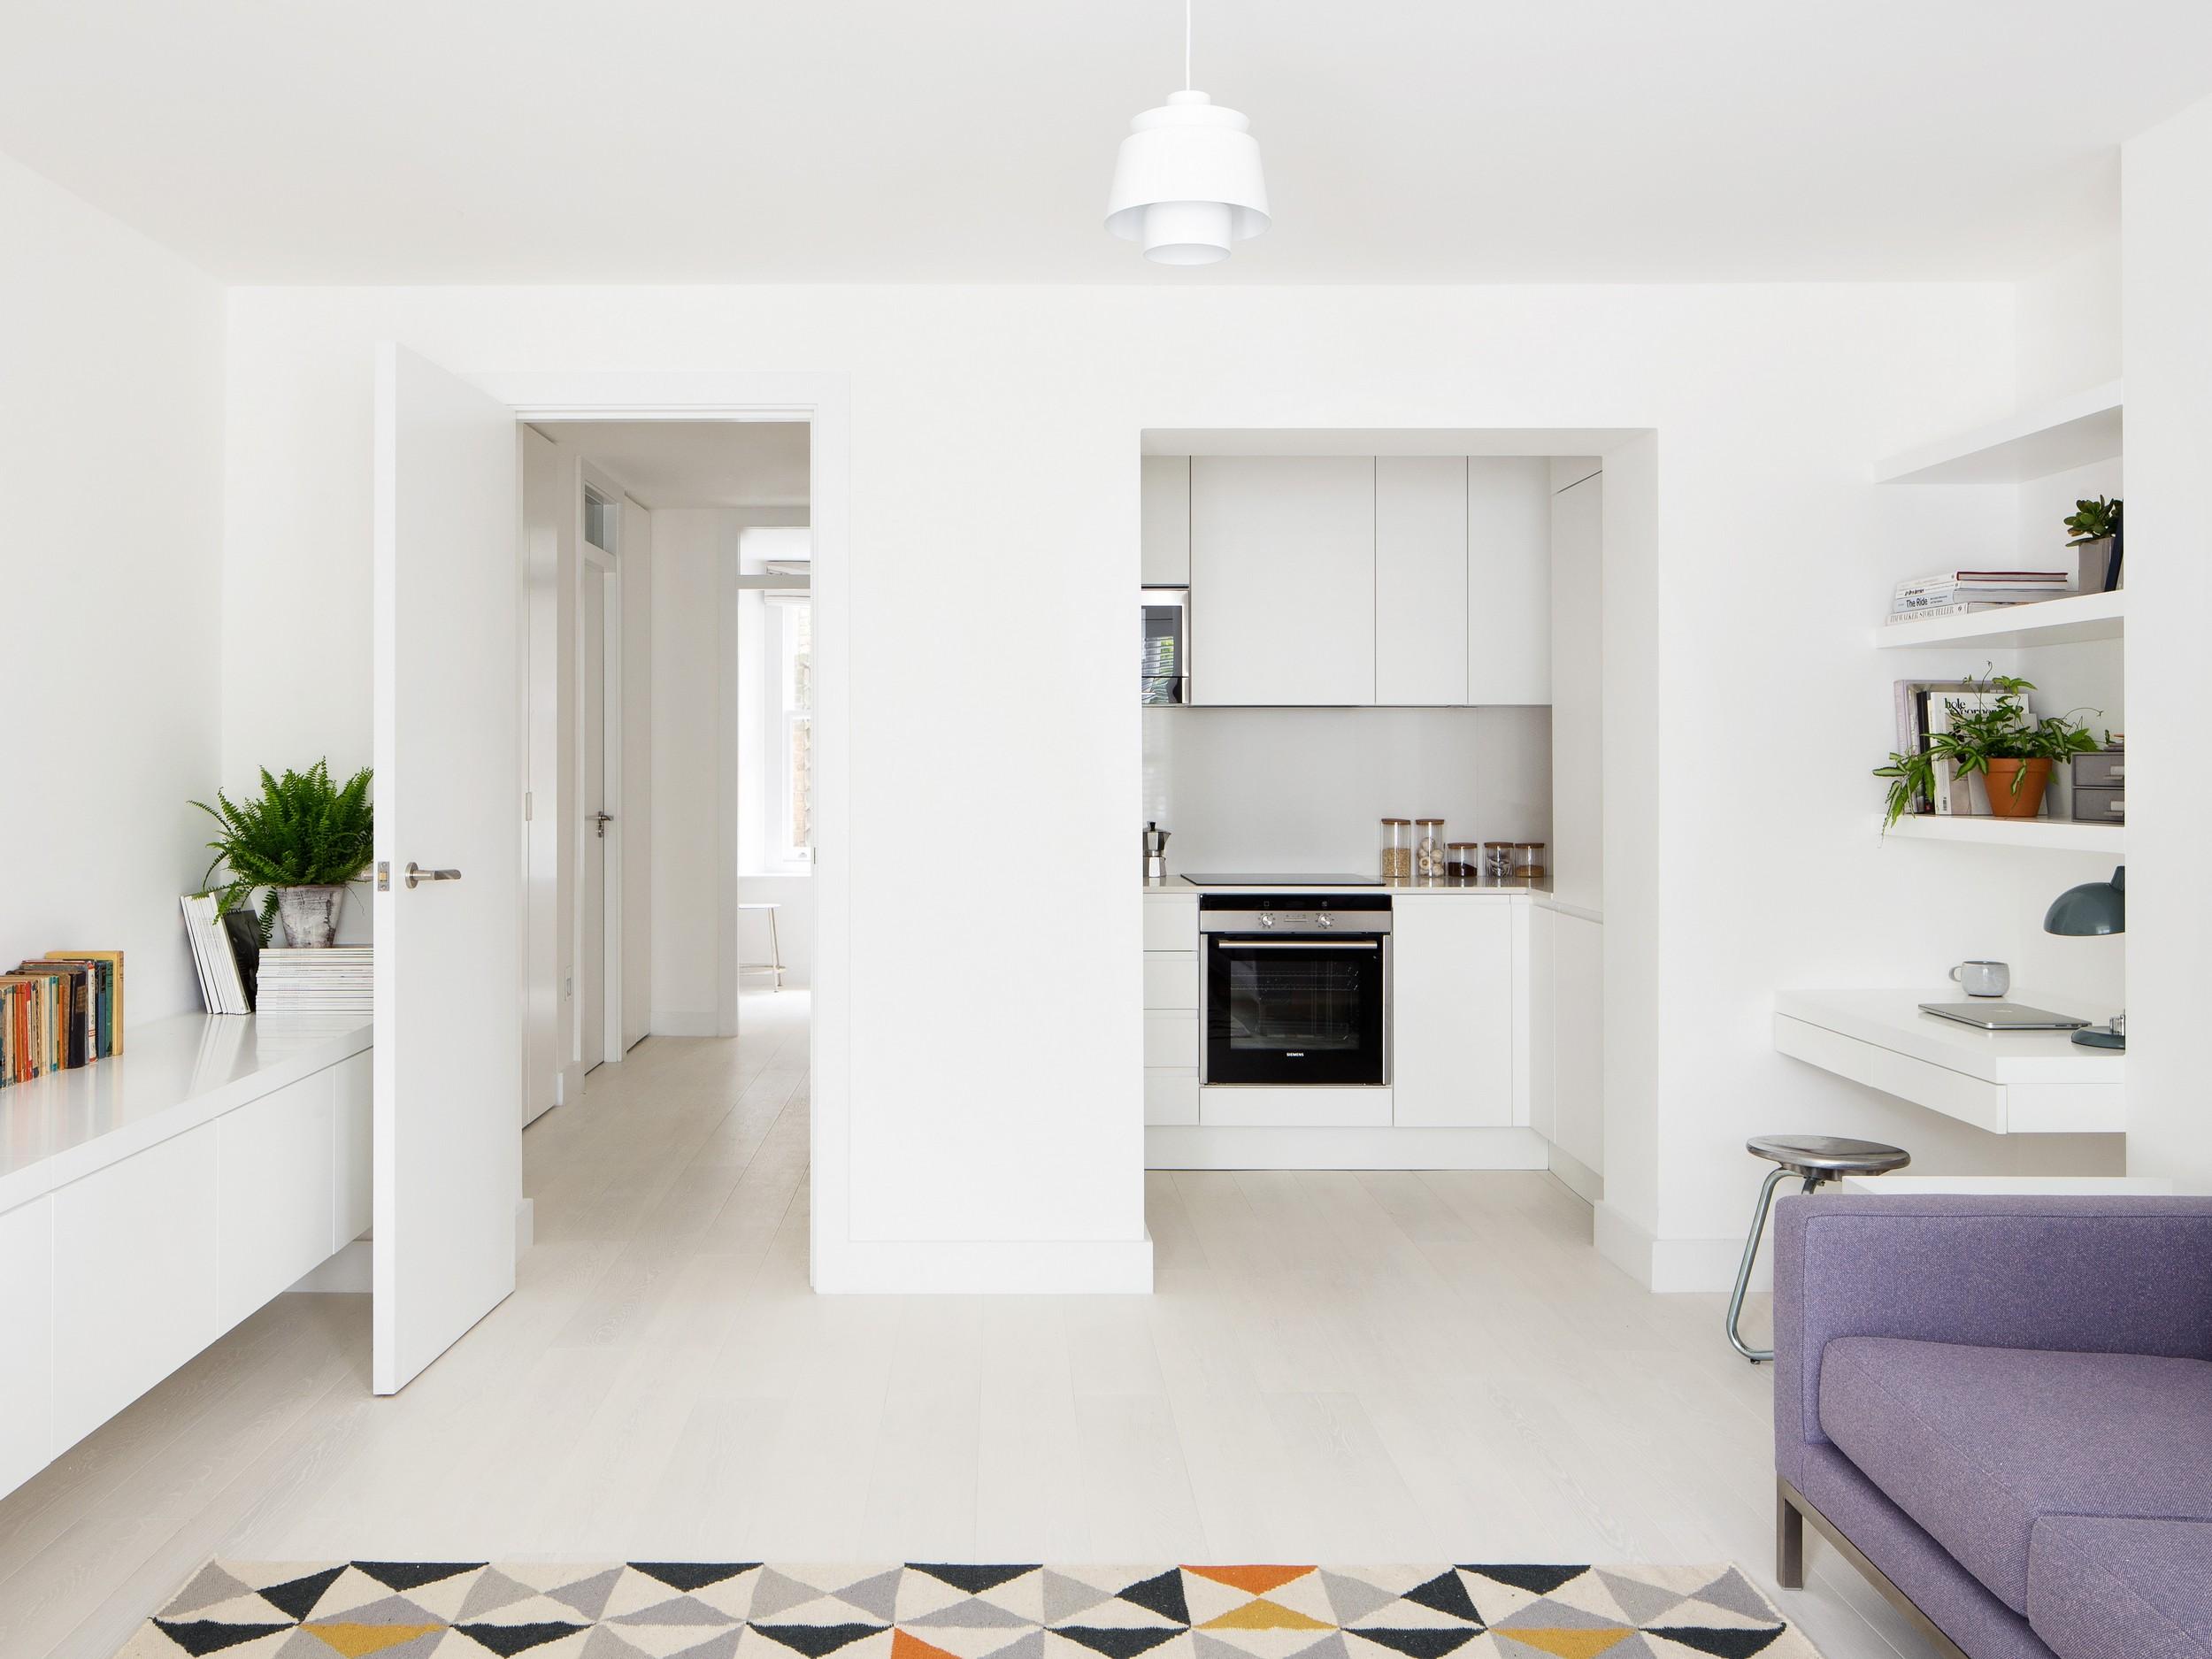 Primrose Hill apartment by Amos Goldreich Architecture